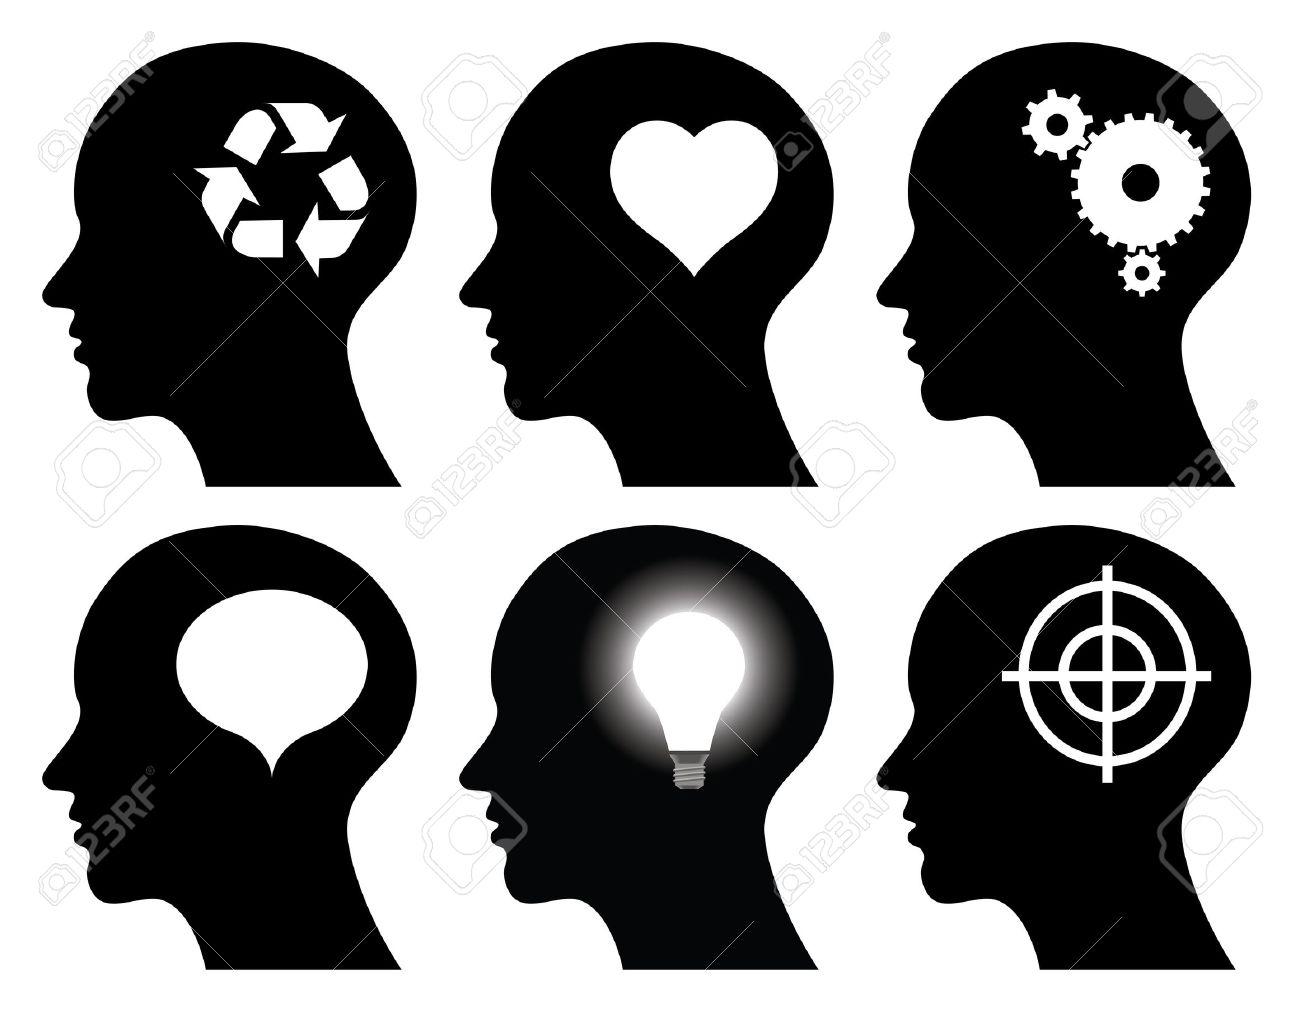 black head profiles with idea symbols, abstract illustrations Stock Vector - 12473410